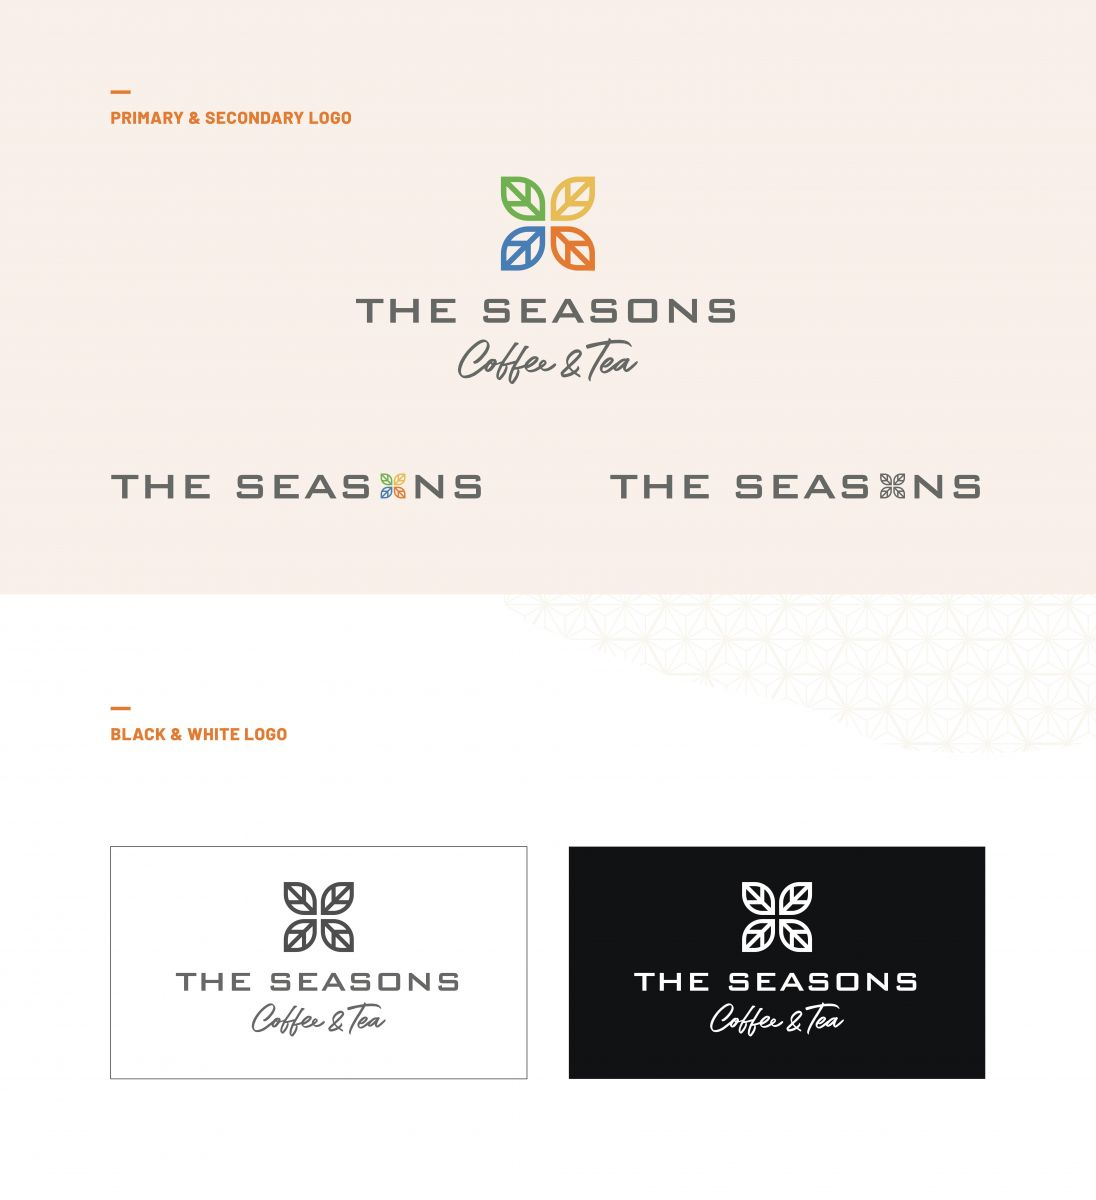 bo-nhan-dien-thuong-hieu-the-season-vinh-long